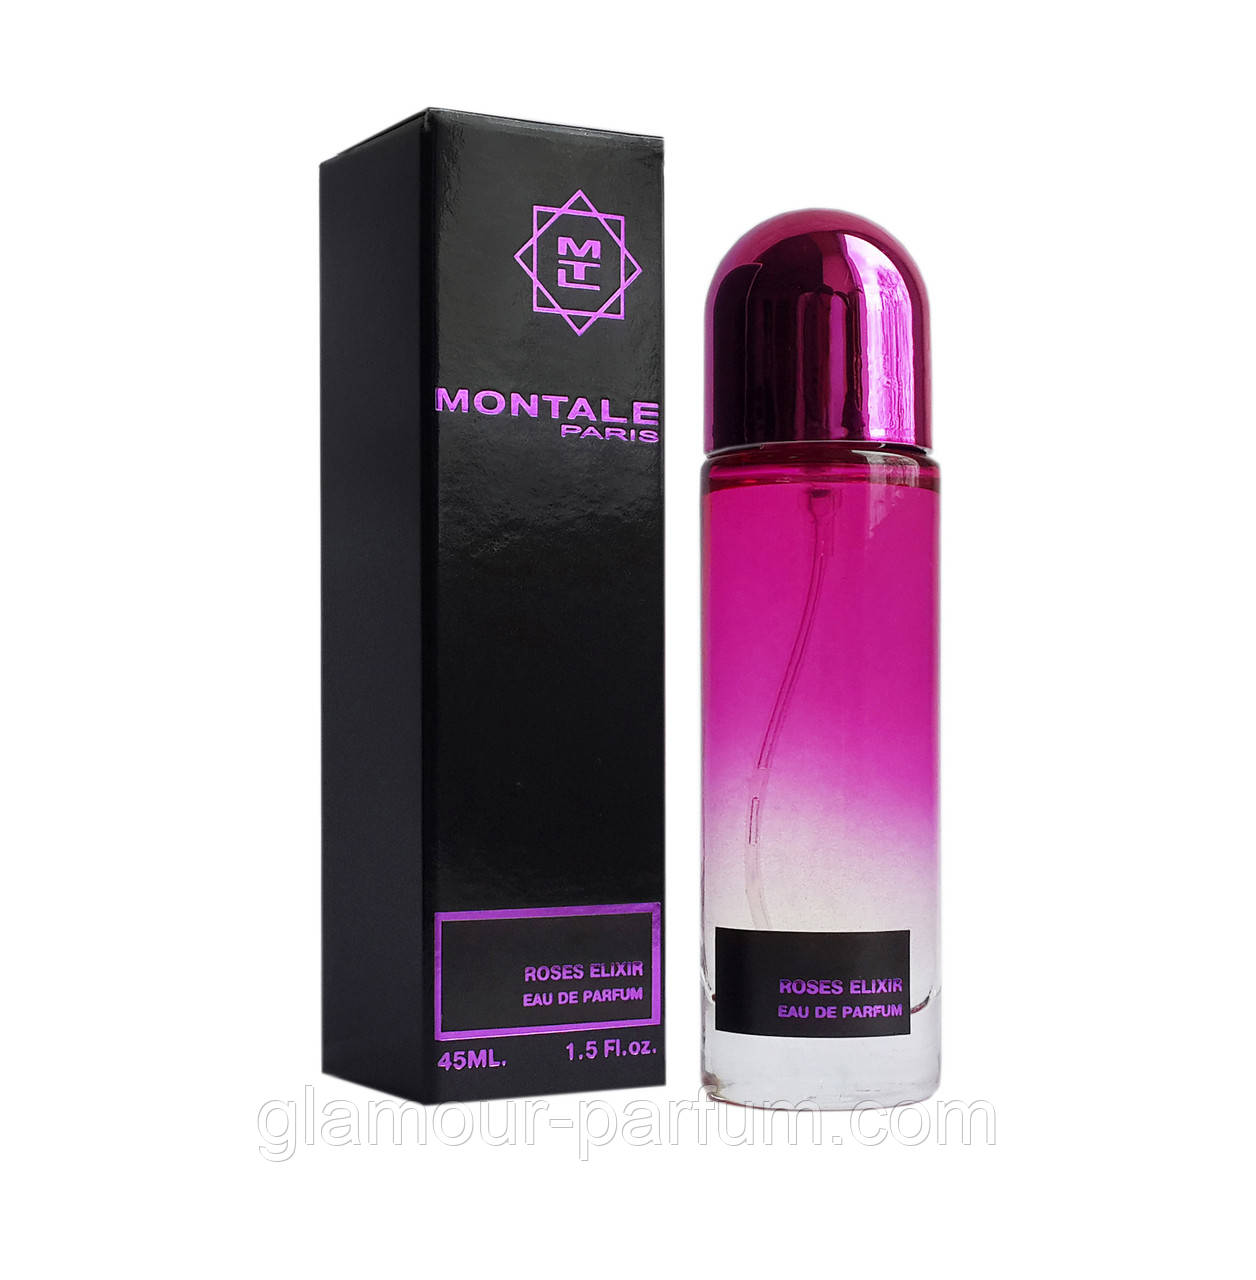 Montale Roses Elixir (Монталь Розес Элексир), 45 мл (реплика) ОПТ